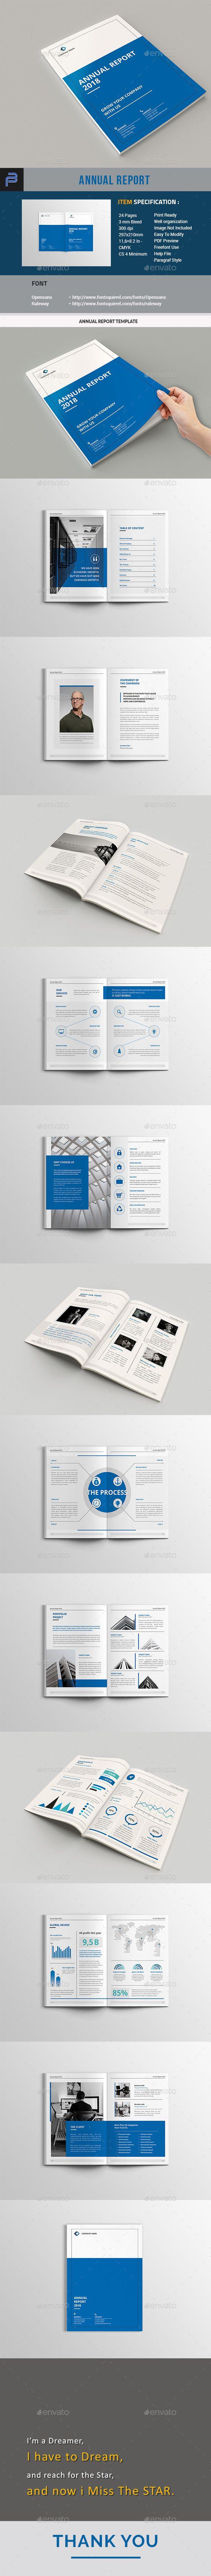 annual report corporate brochures ビジネス パンフ pinterest